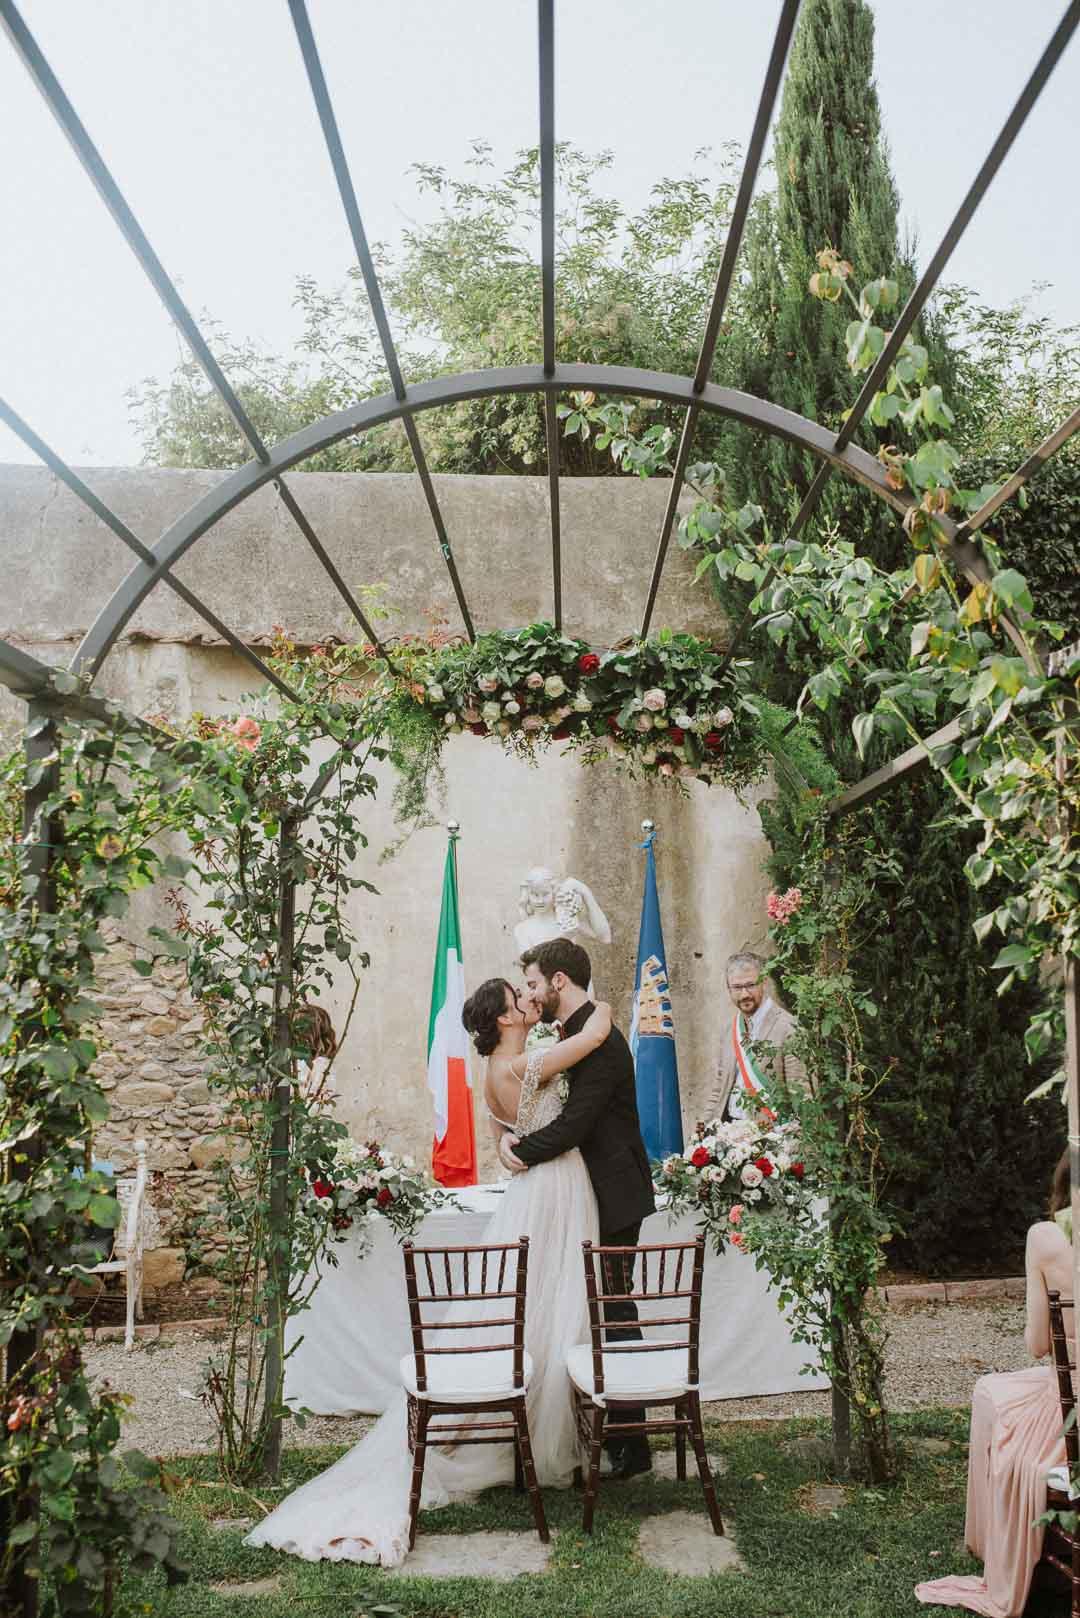 wedding-photographer-destination-fineart-bespoke-reportage-tuscany-villascorzi-vivianeizzo-spazio46-83